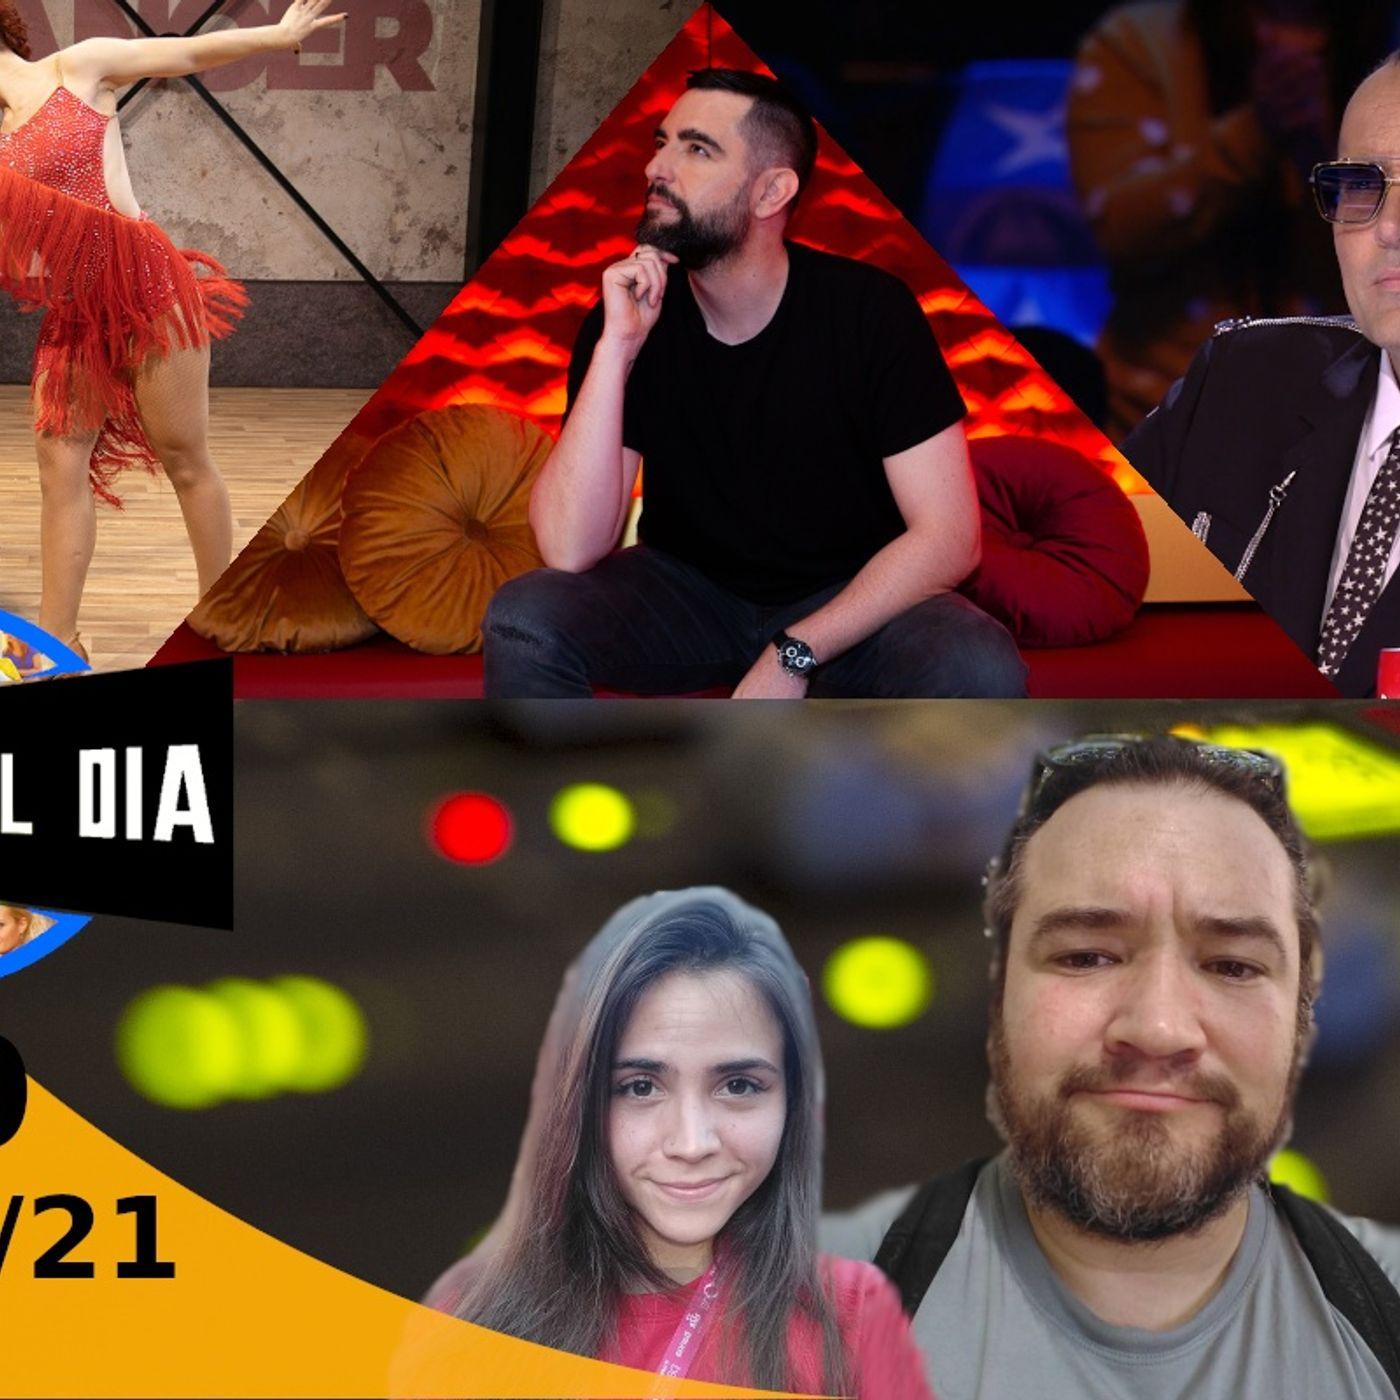 Charulata | Got Talent | The dancer | Ponte al día 430 (16/04/21)